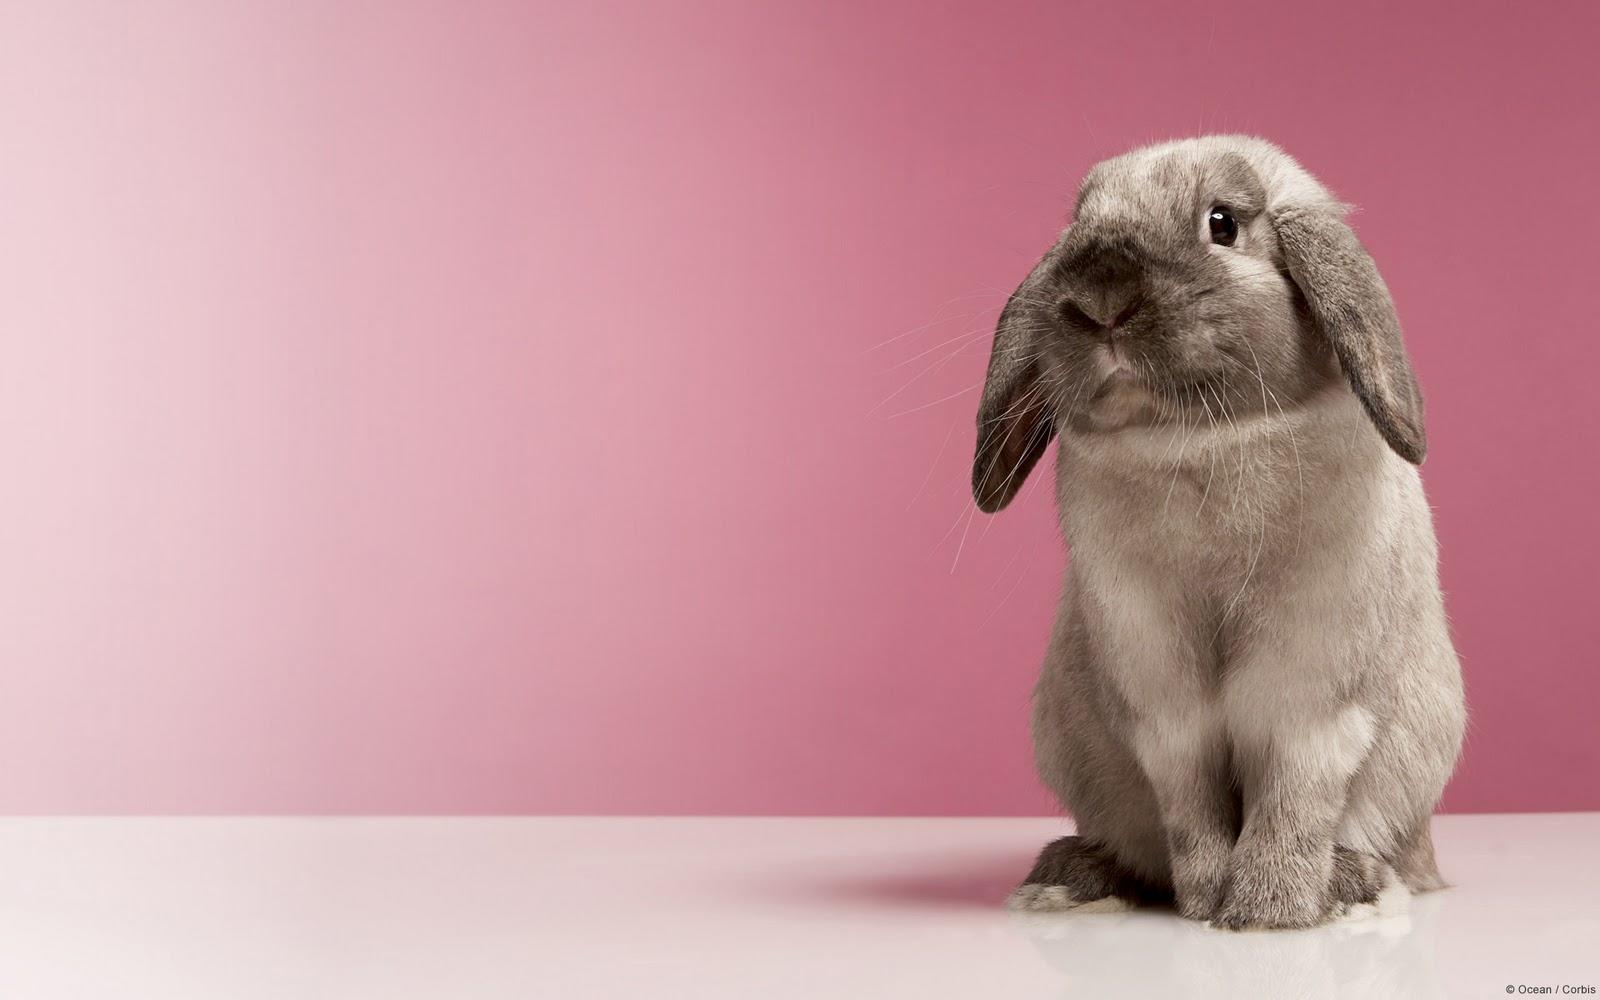 Funny rabbit wallpaper |Funny Animal Funny